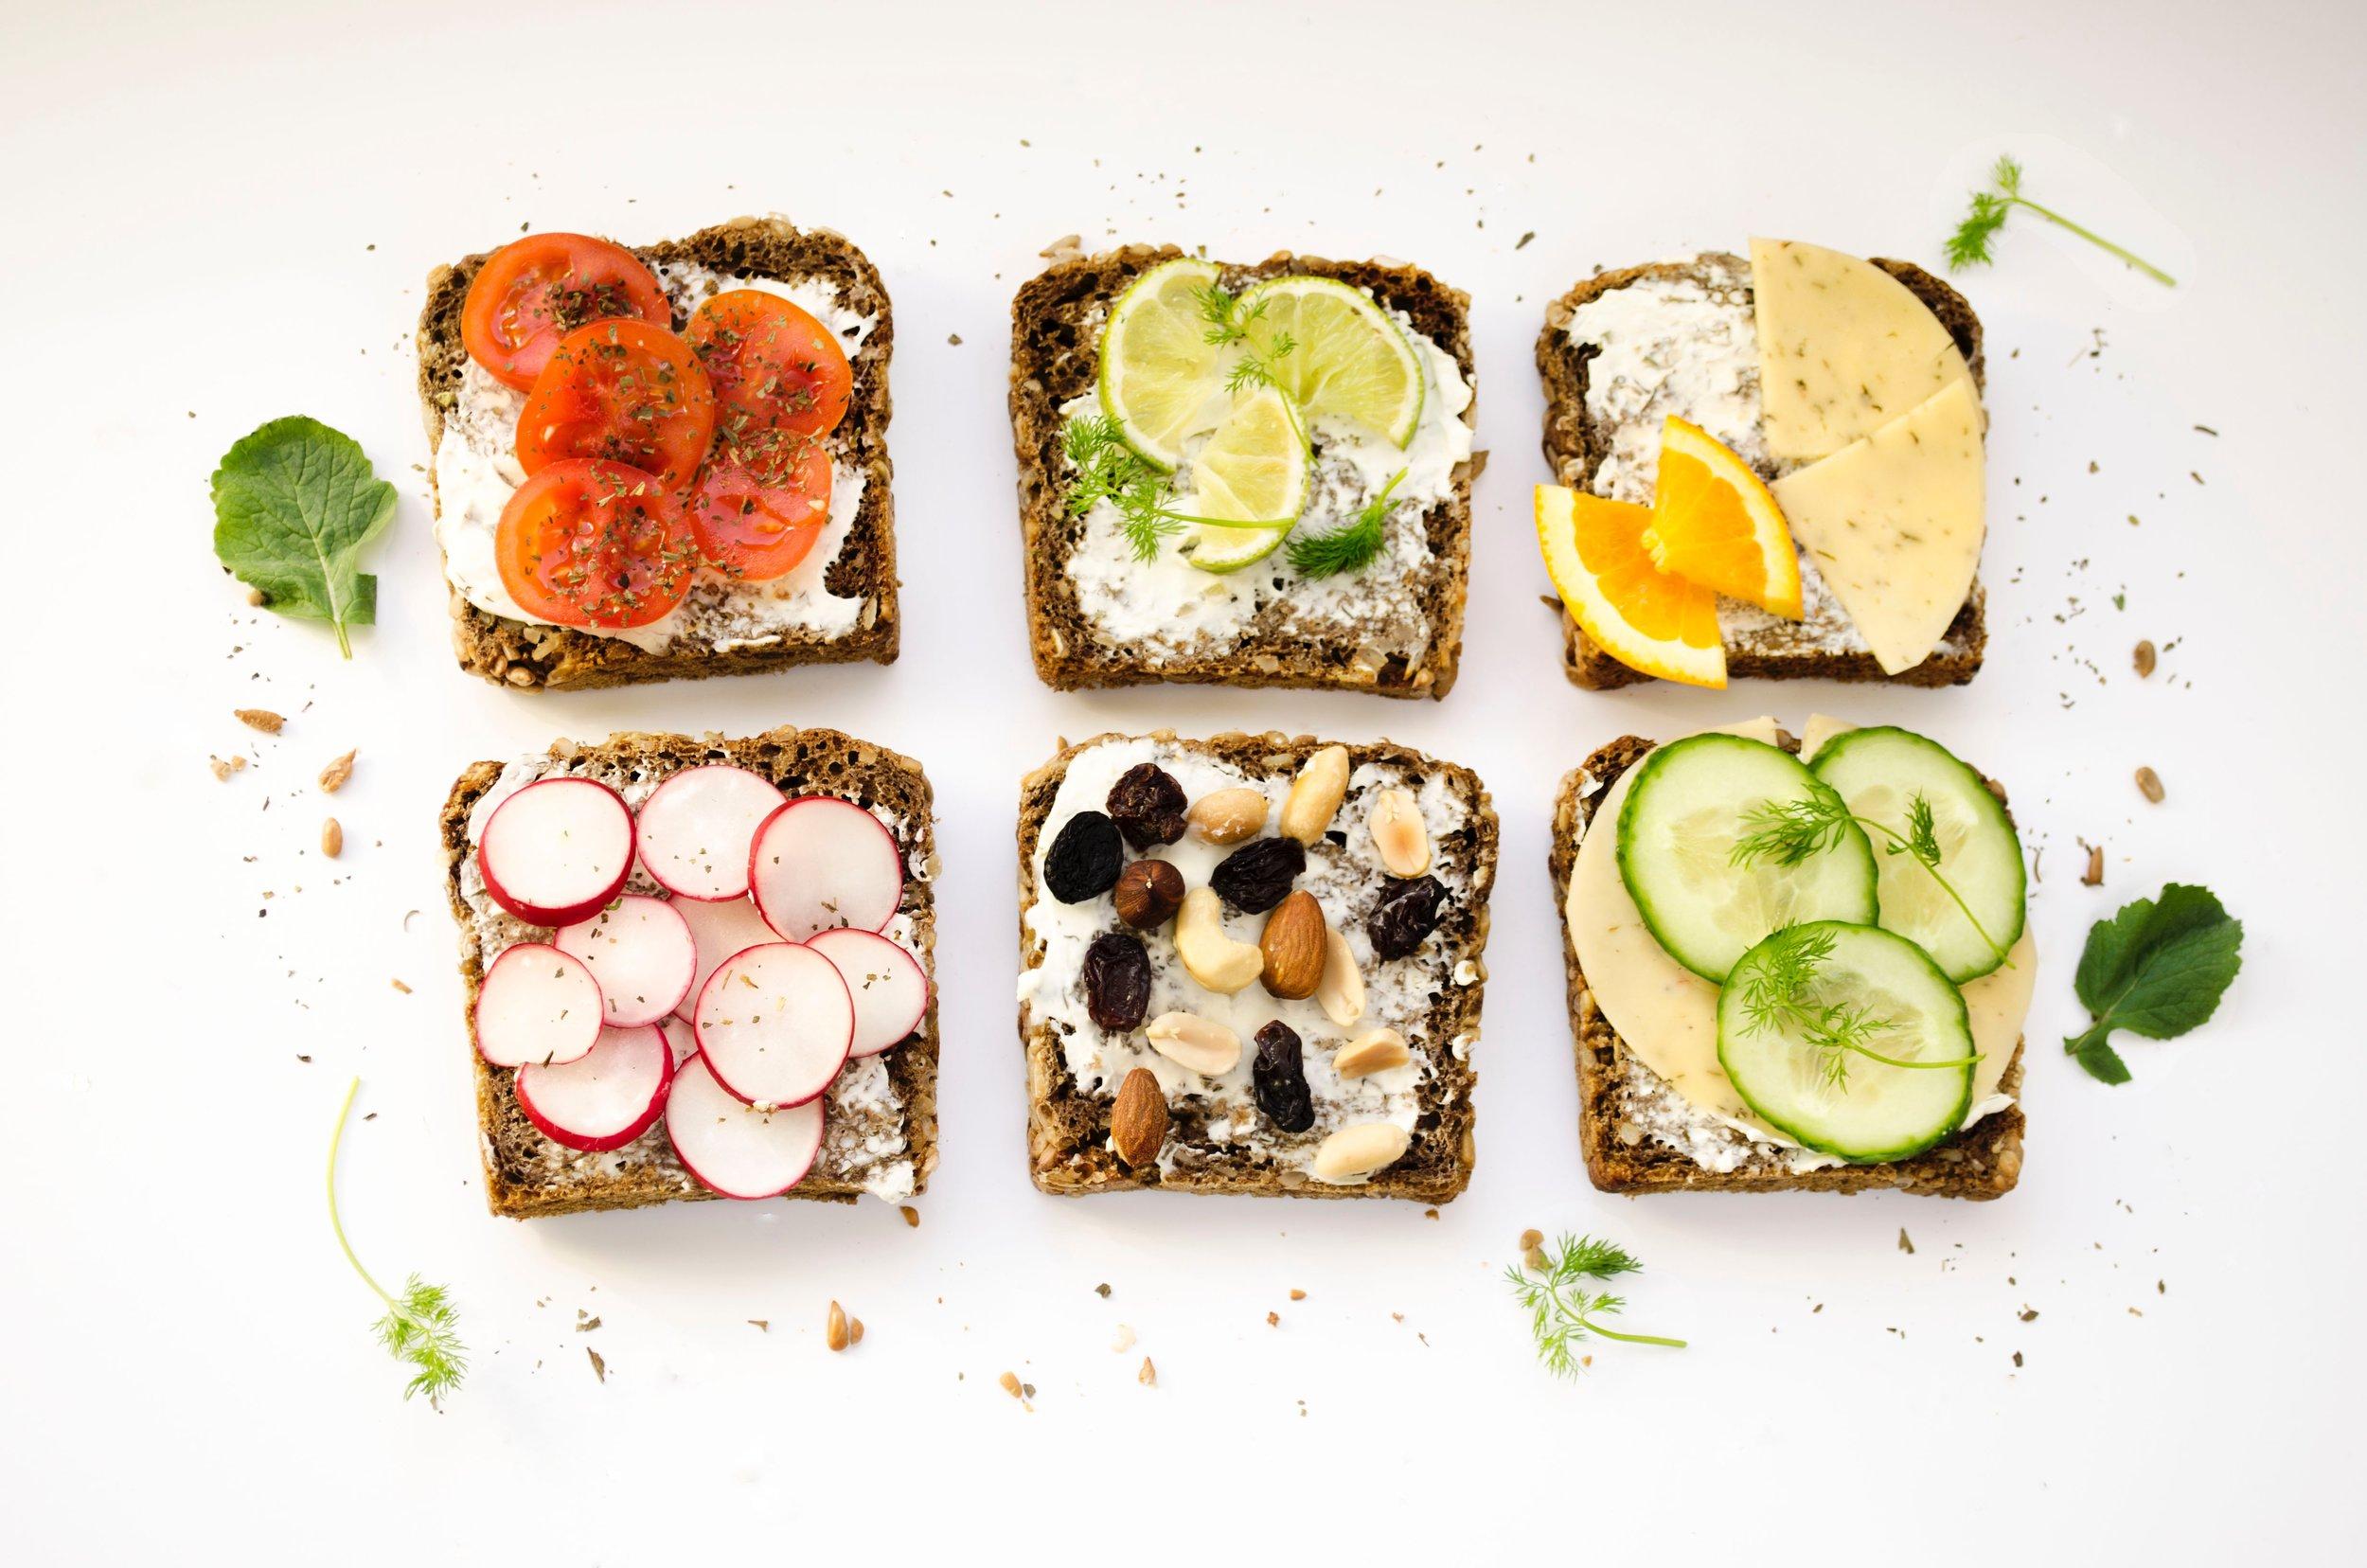 3. Healthy Eating -